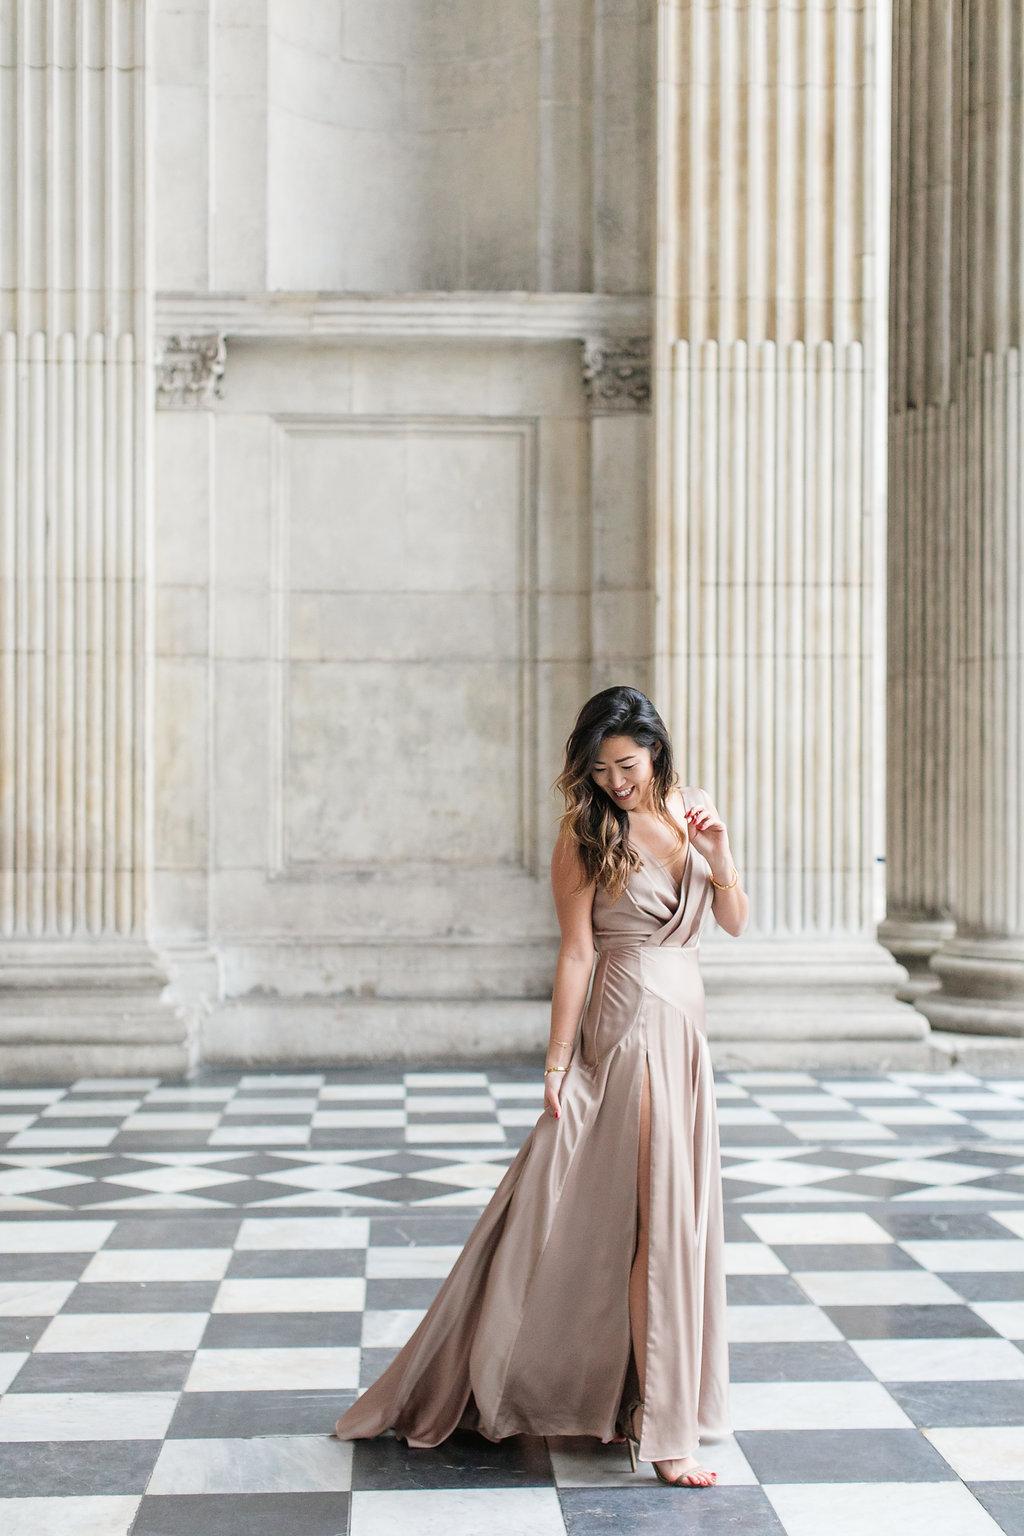 Felicia Stylechine